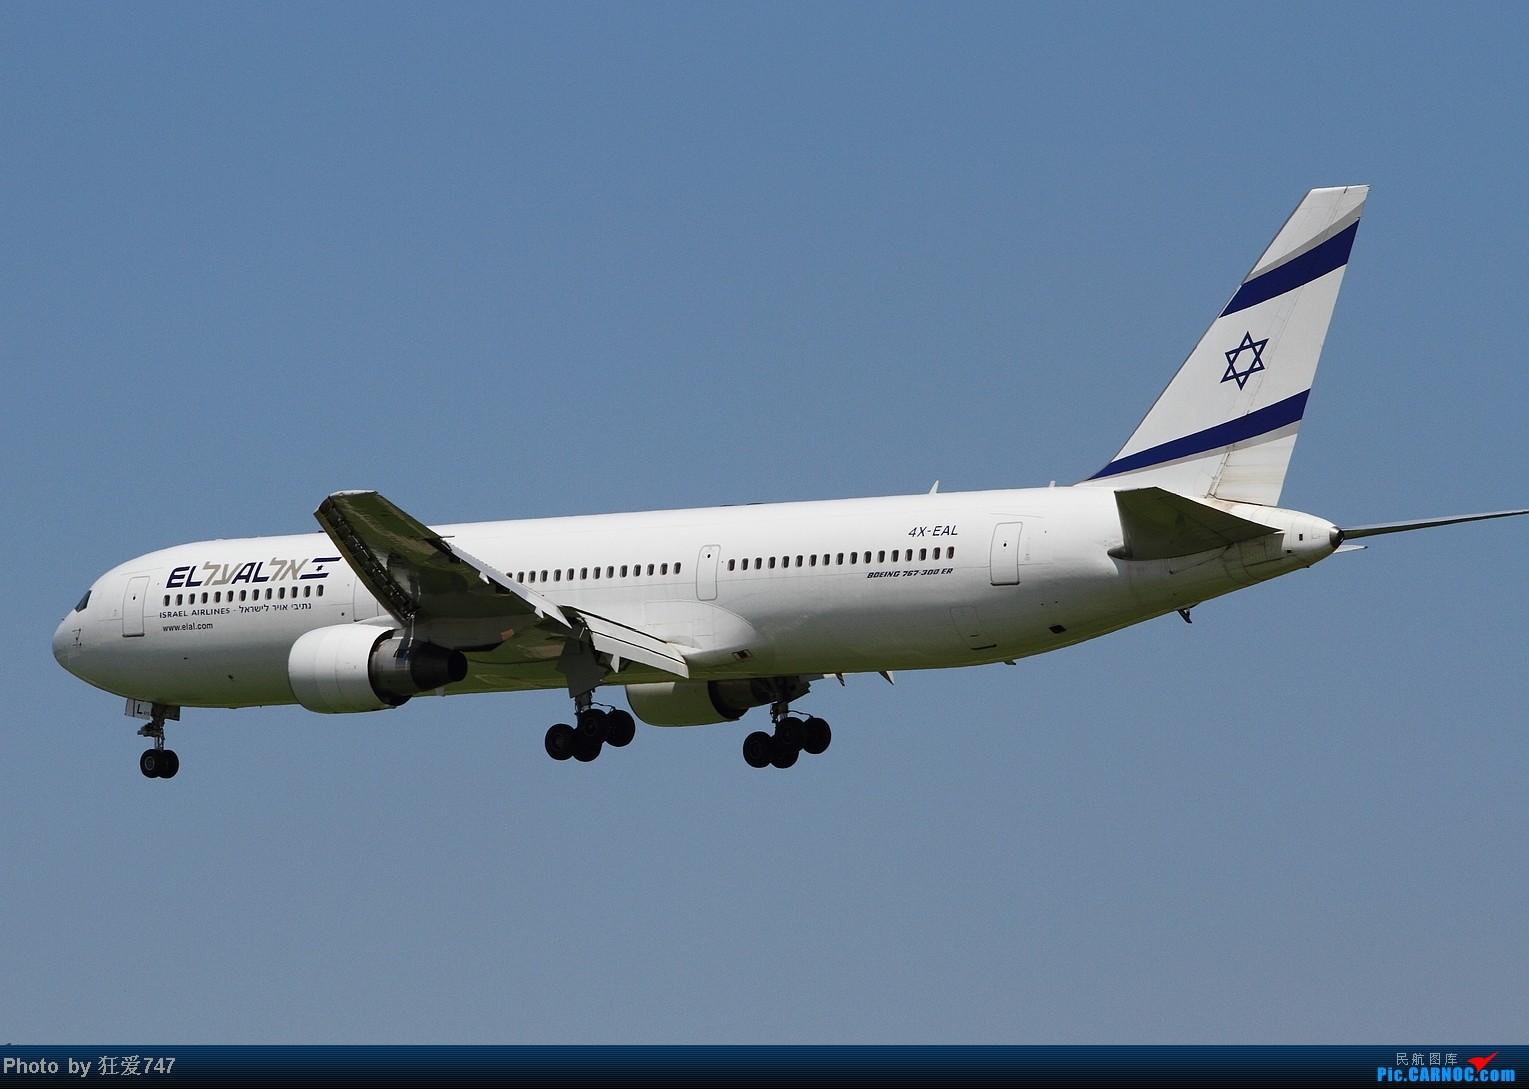 Re:[原创]三张图:来自特拉维夫的大卫星-以色列767. BOEING 767-33A/ER 4X-EAL 中国北京首都机场